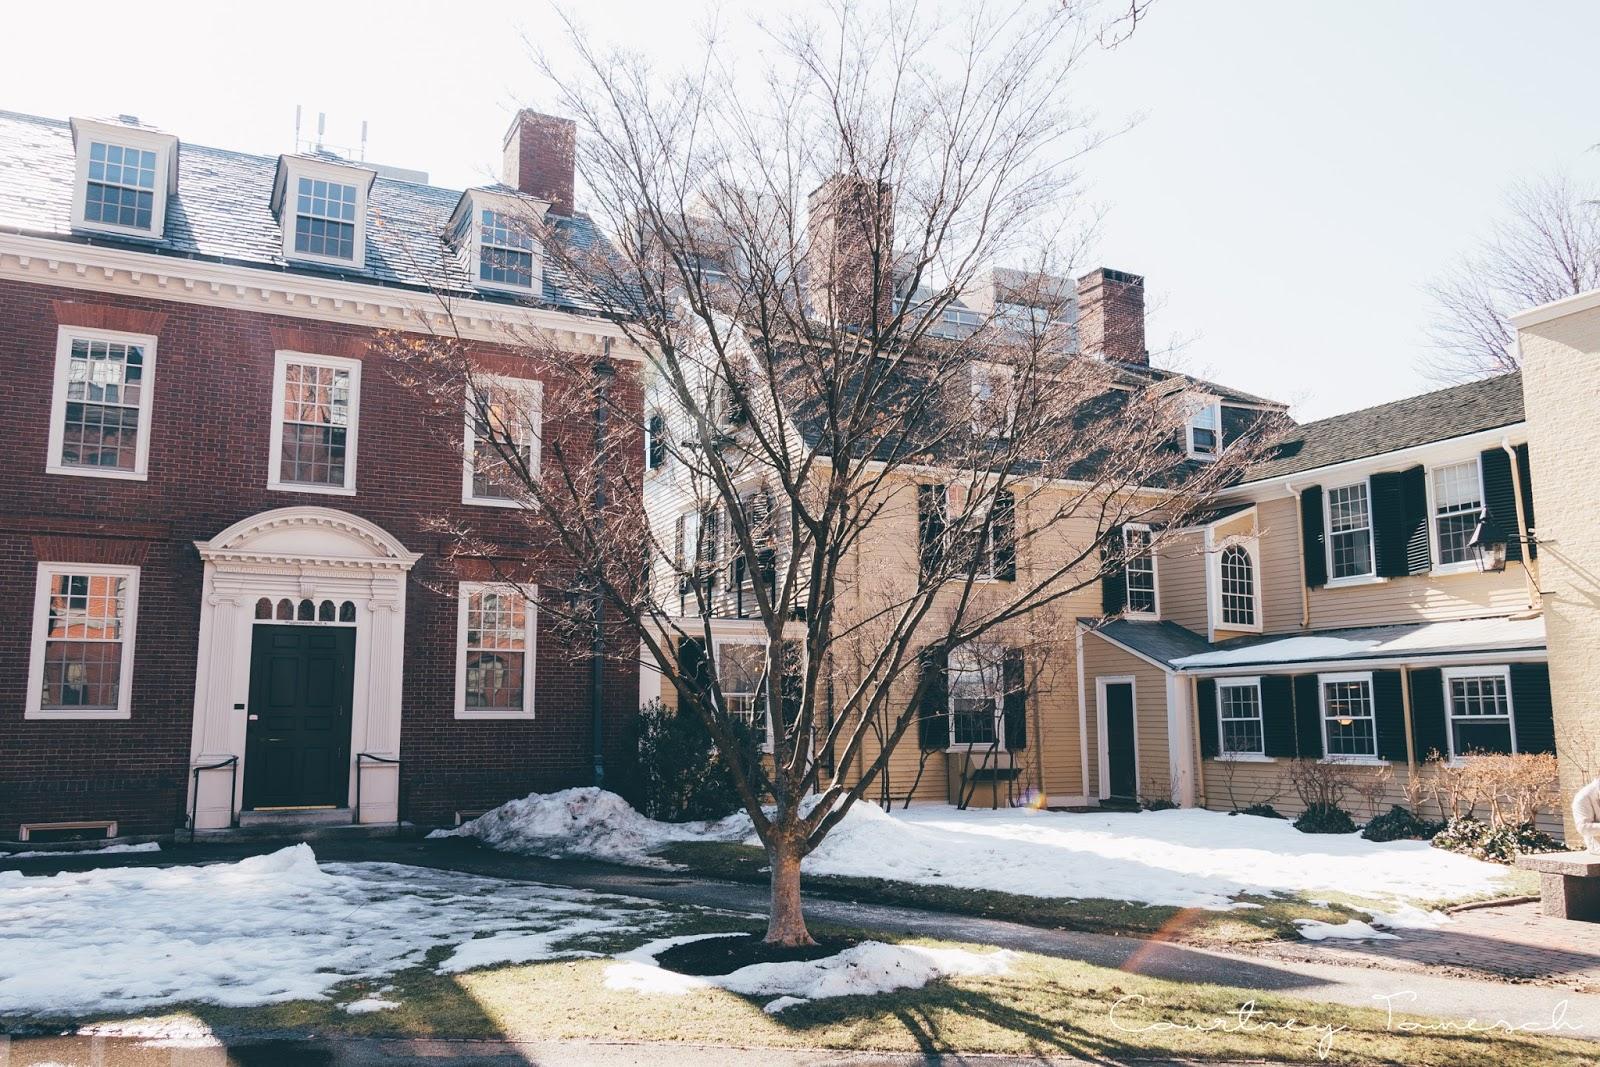 Courtney Tomesch Harvard Square Cambridge Mass